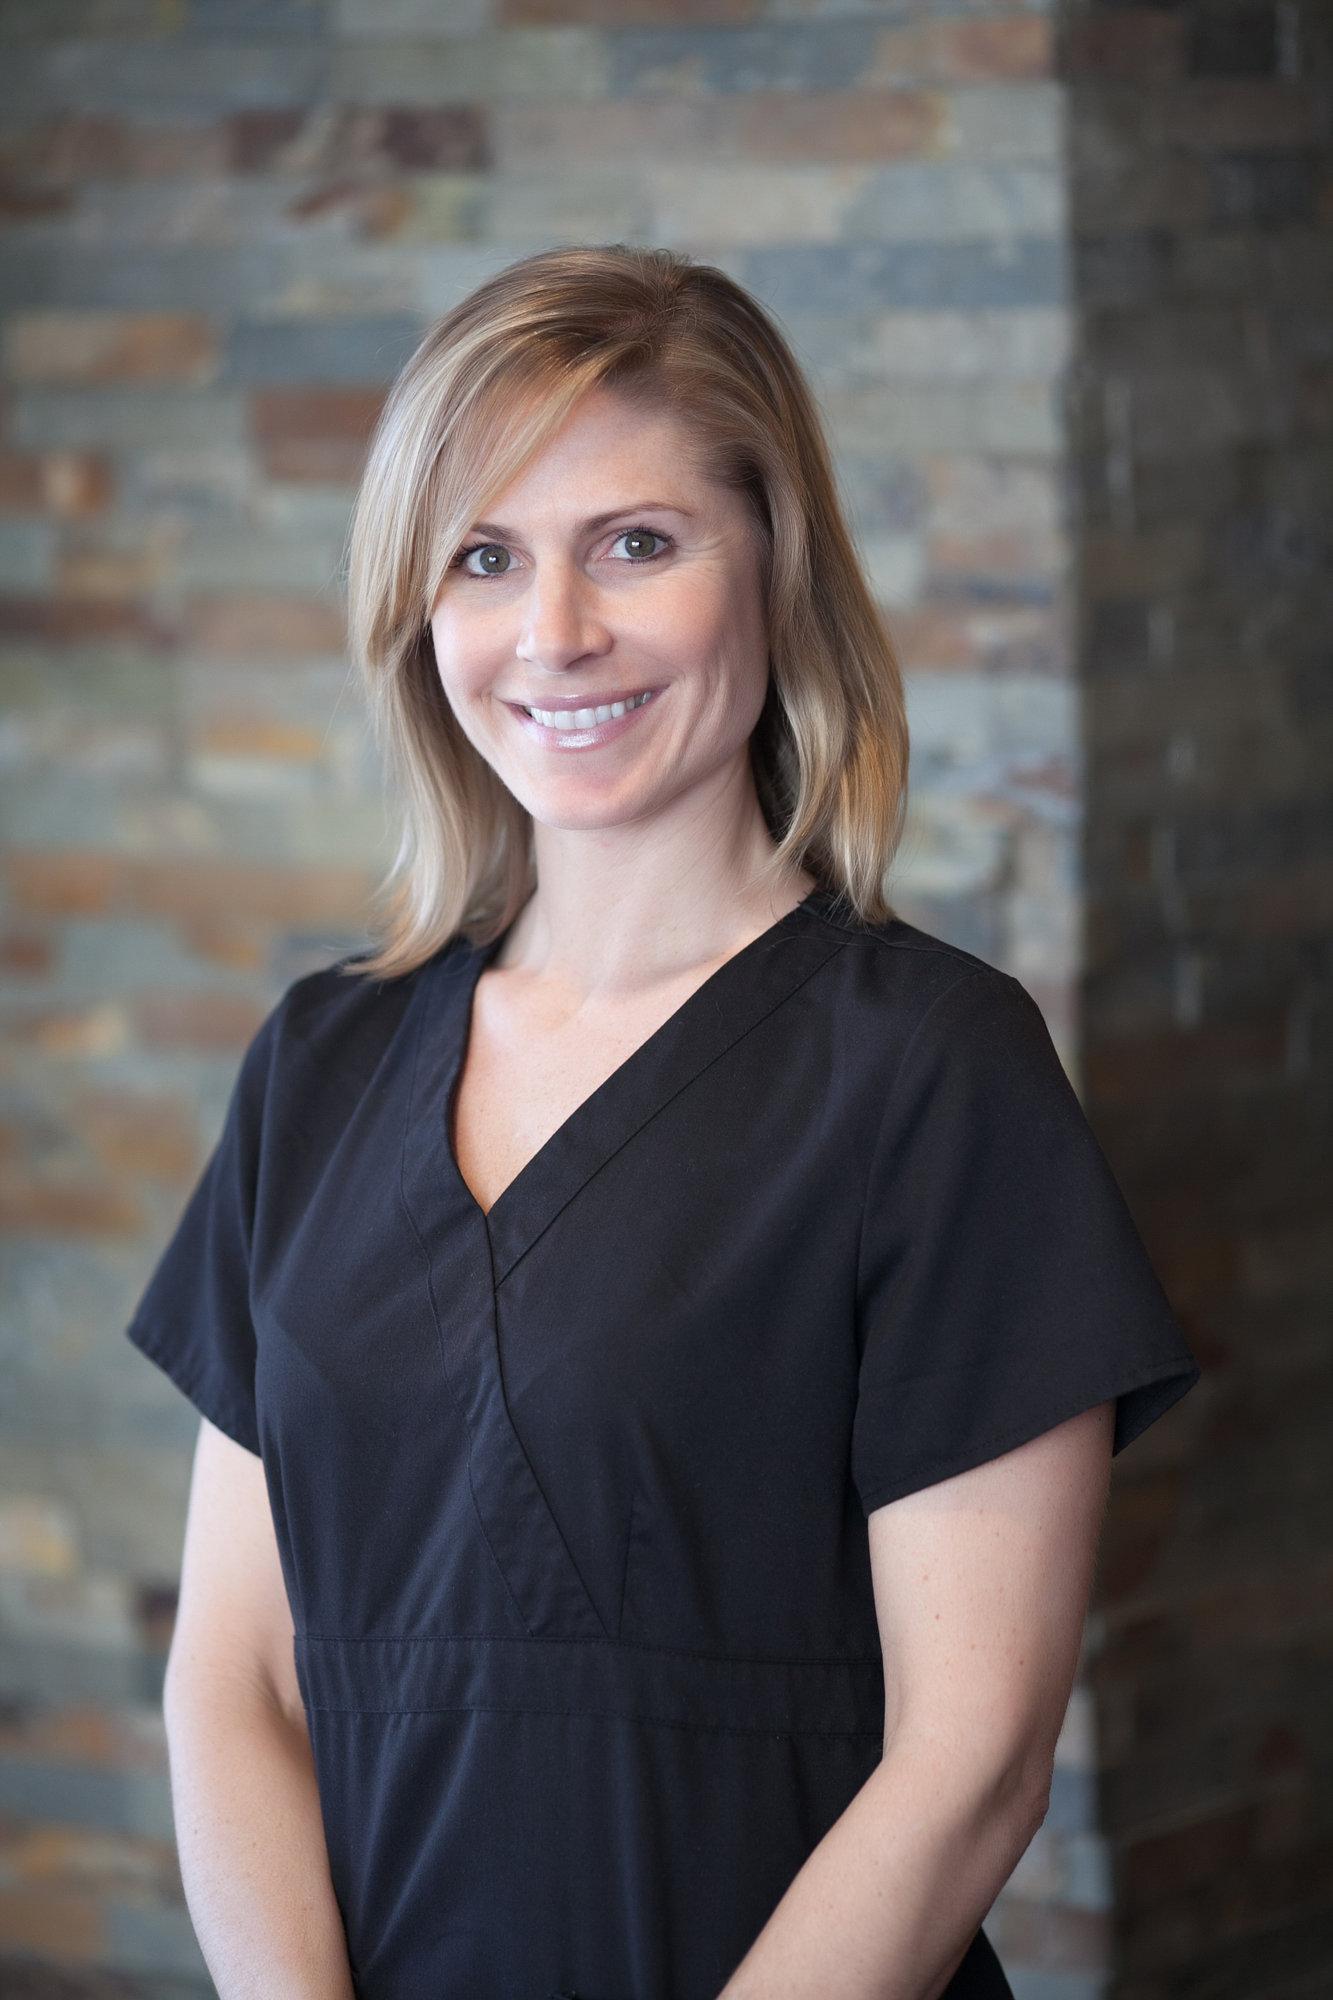 Spanish Speaking Nurse